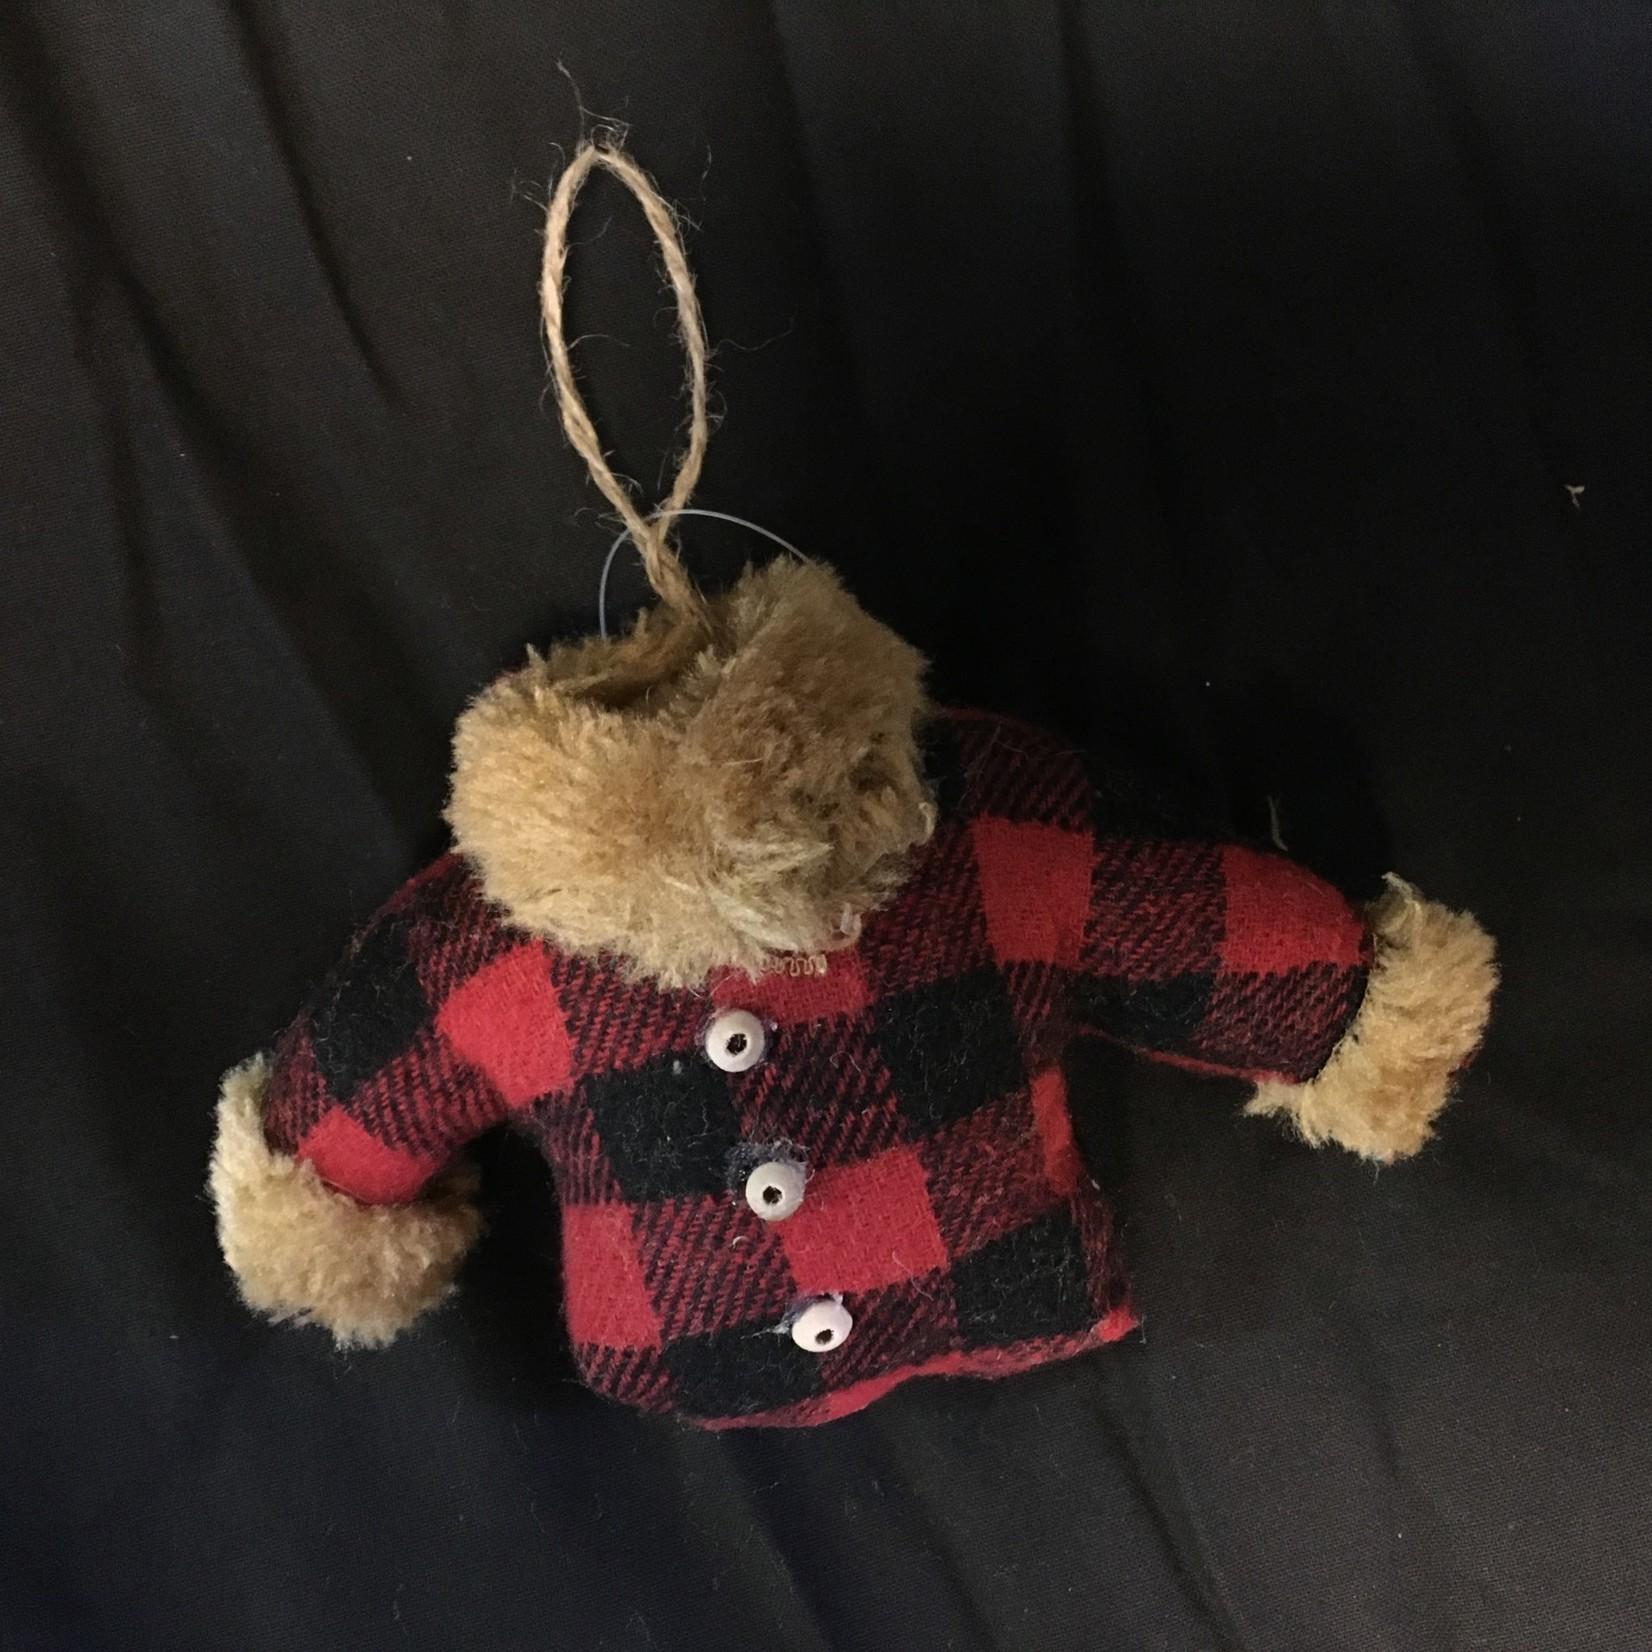 Plaid Coat w/Fur Ornament